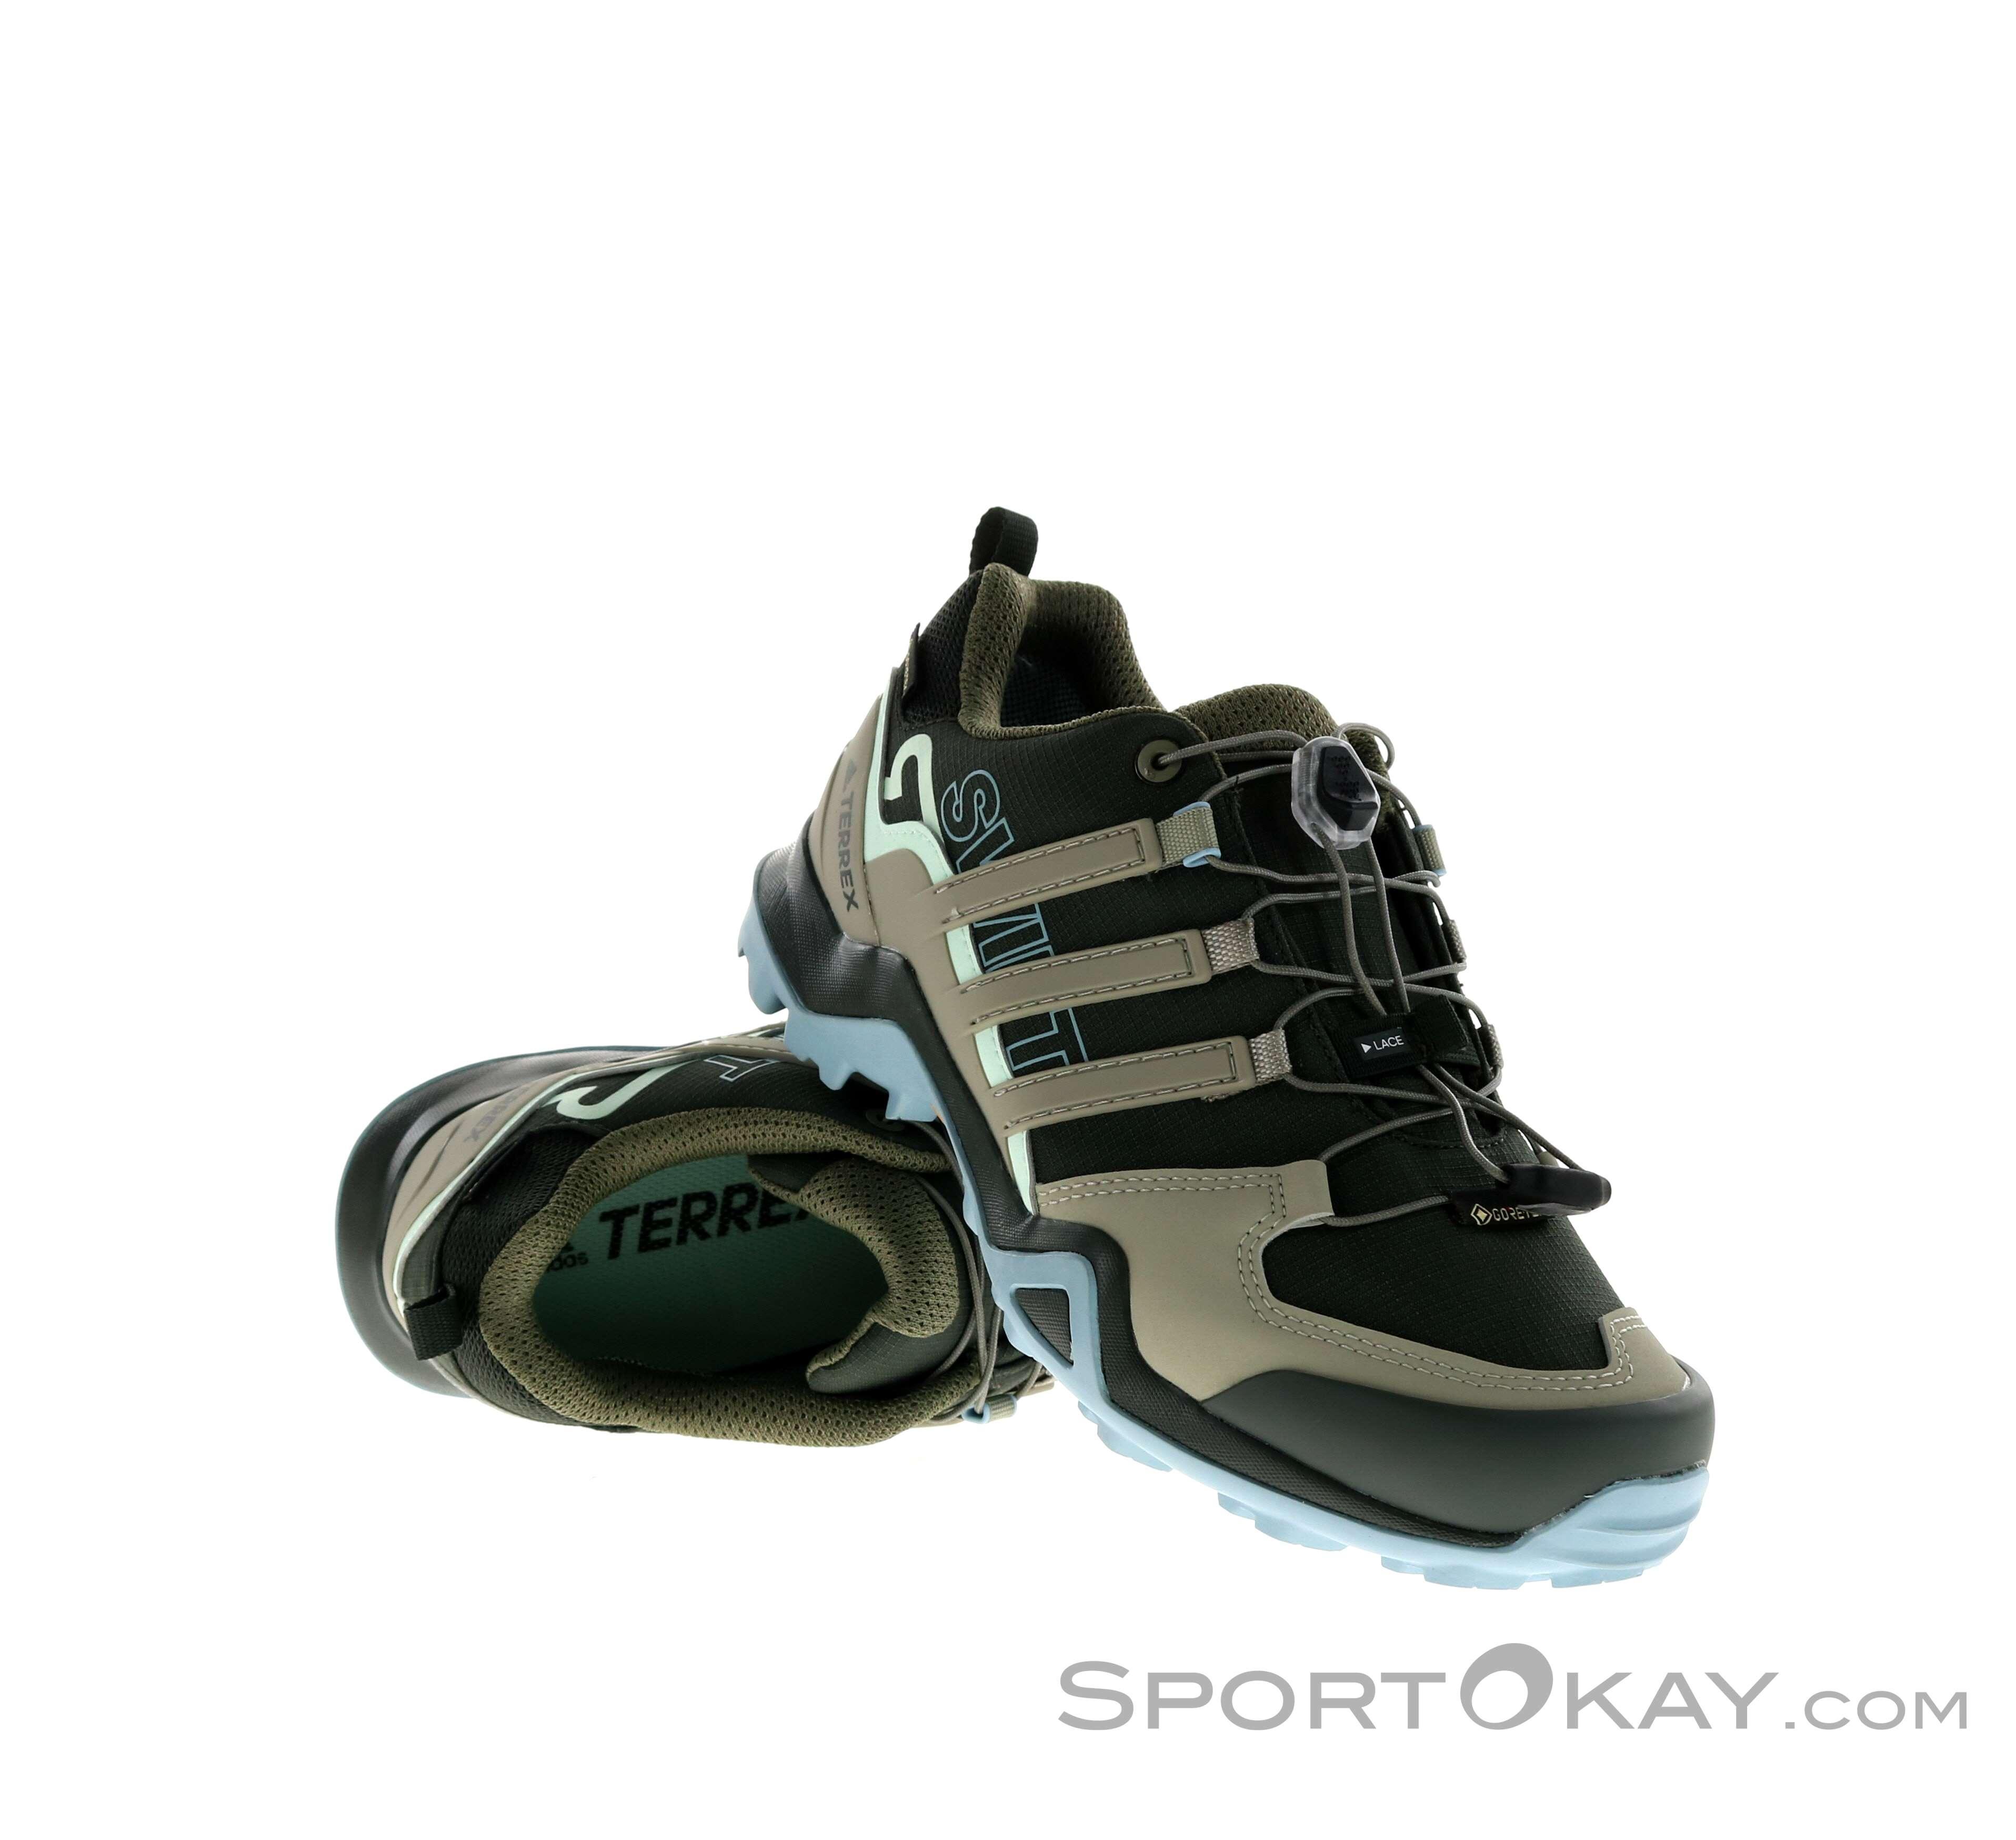 la licenciatura representación guisante  adidas Terrex Swift R2 GTX Womens Hiking Boots - Hiking Boots - Shoes &  Poles - Outdoor - All